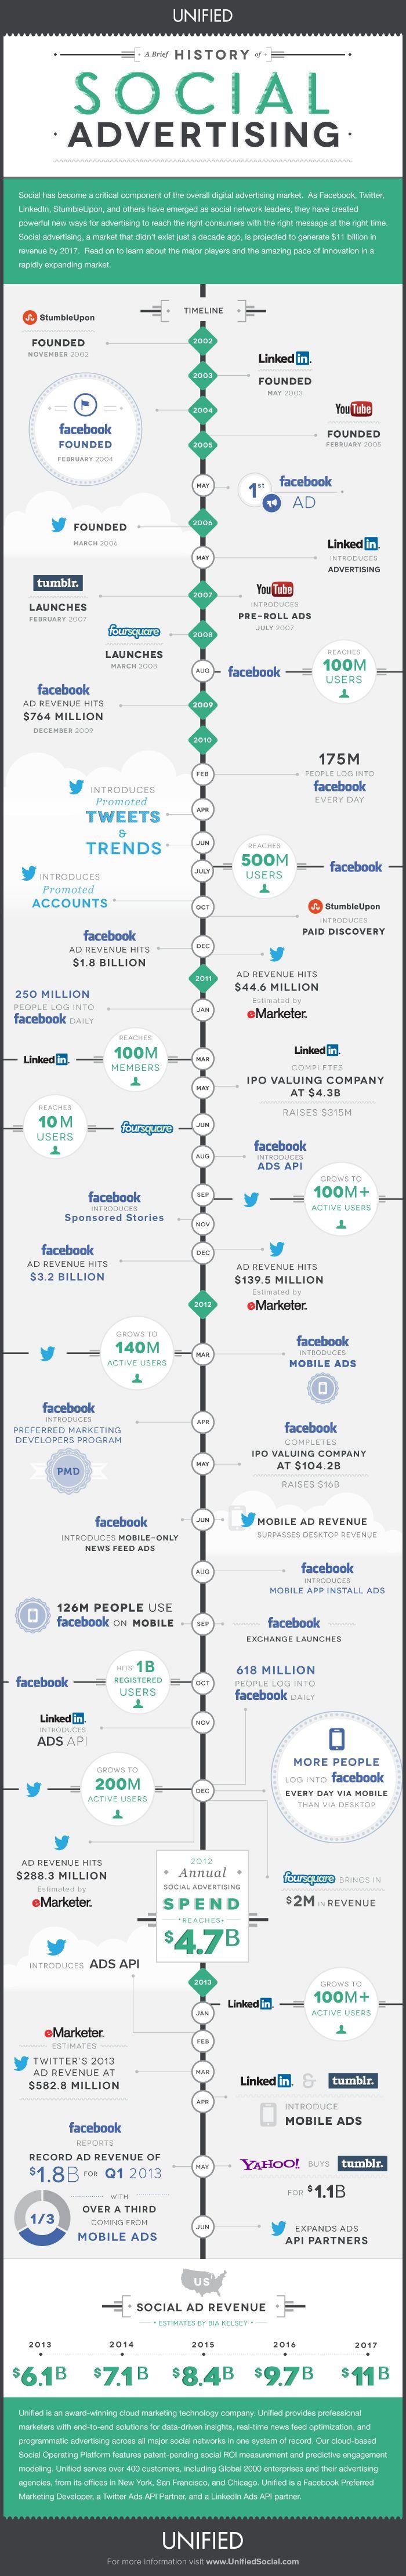 StuartJDavidson.com | Getting Started With Social Advertising [Infographic] | http://stuartjdavidson.com via @stuartjdavidson